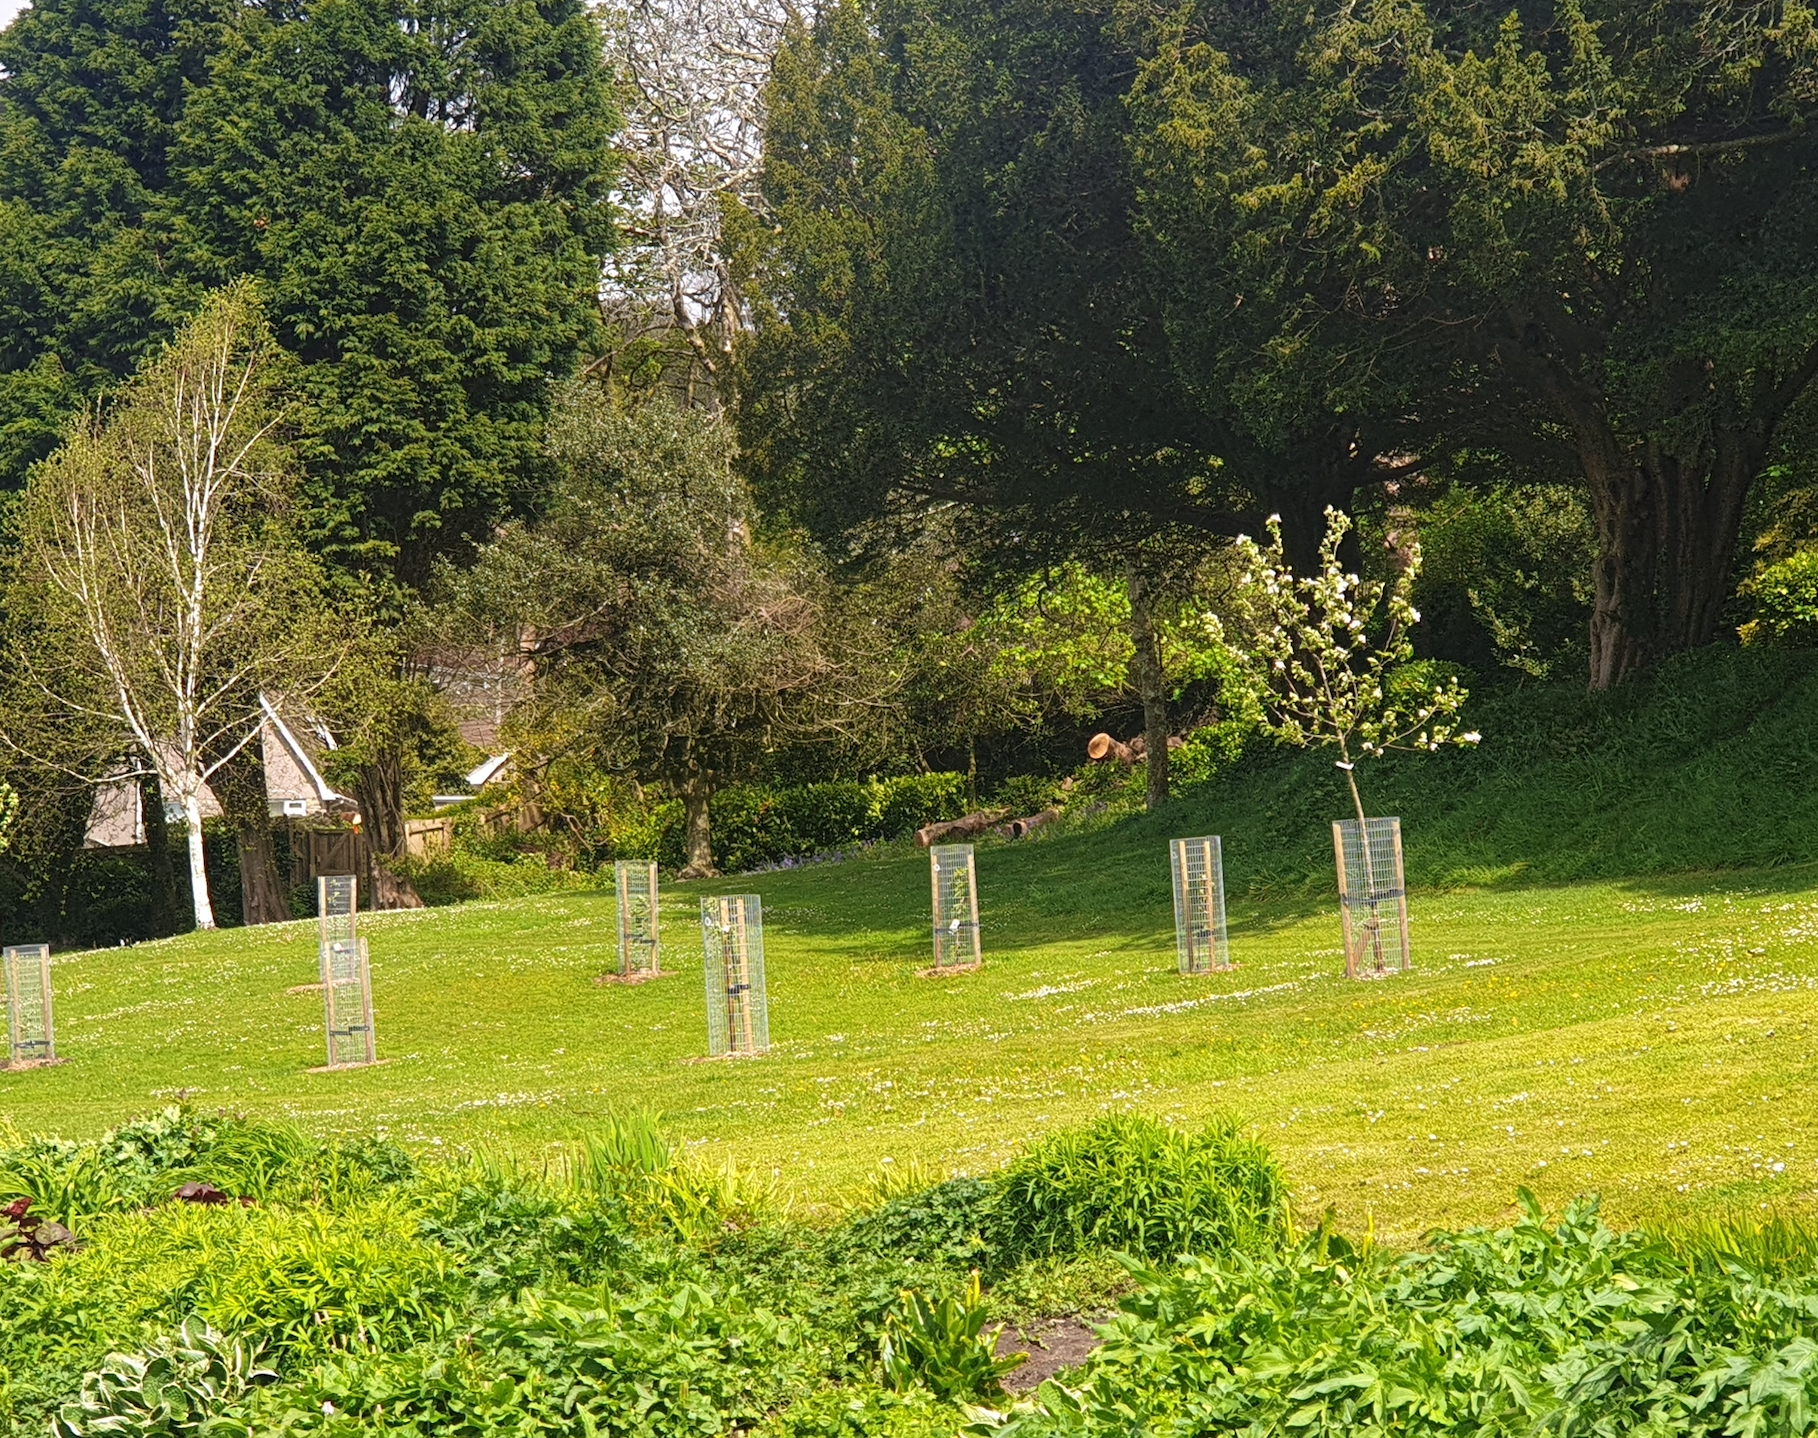 Growing Sanctuary in Swansea